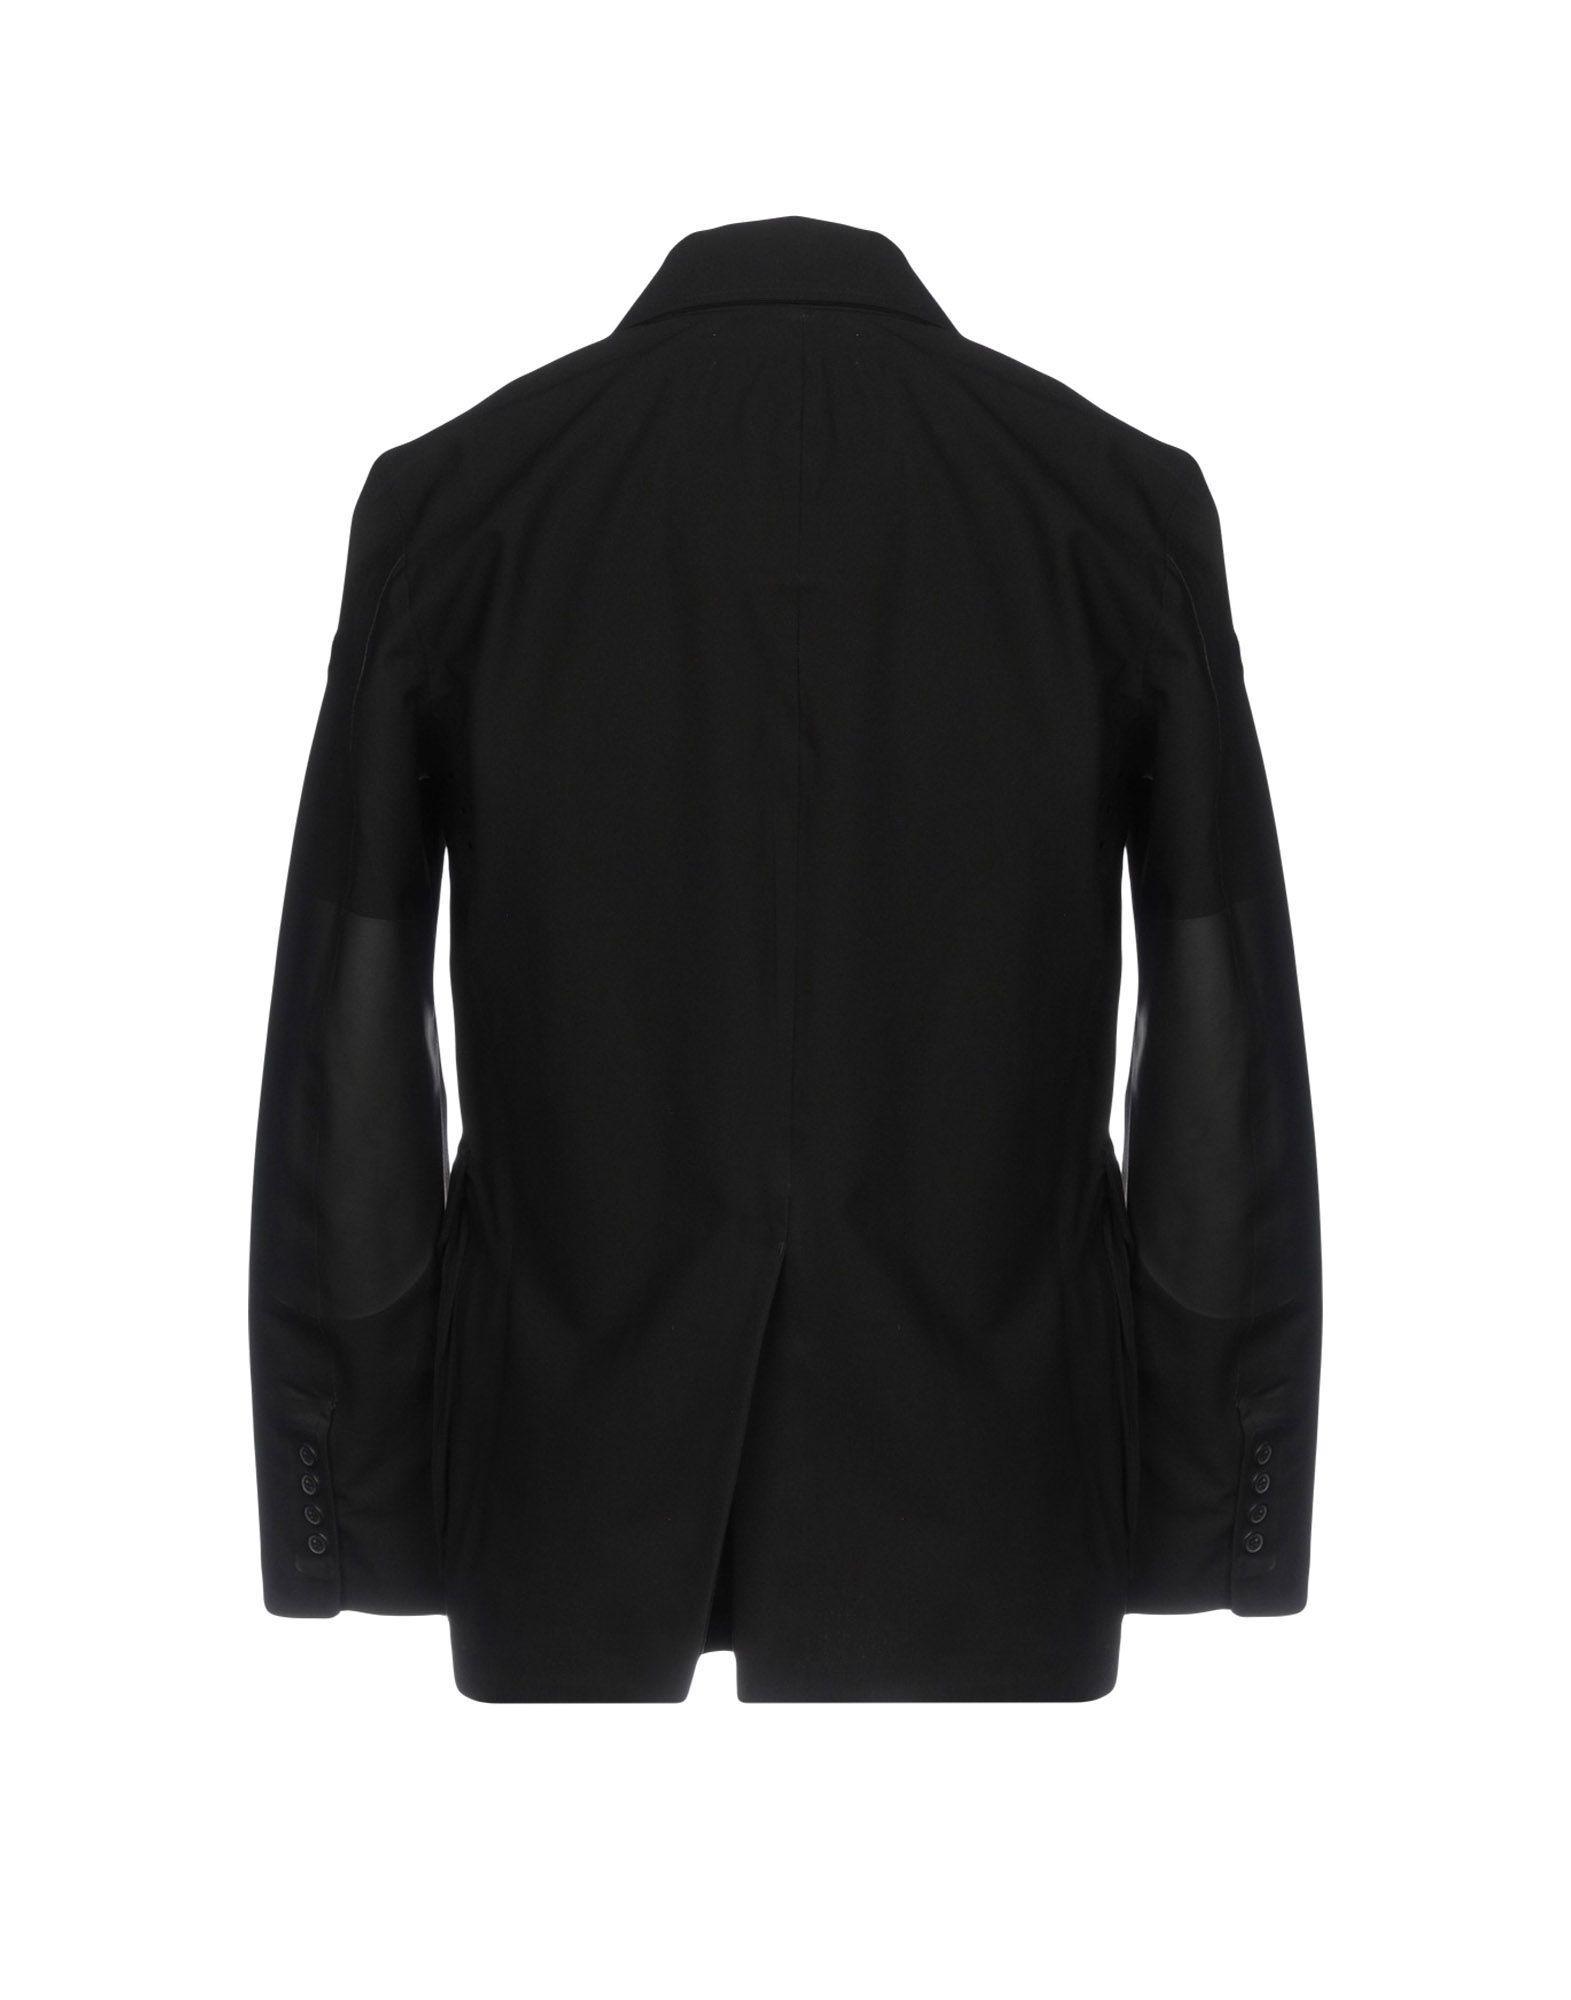 Victorinox Synthetic Jacket in Black for Men